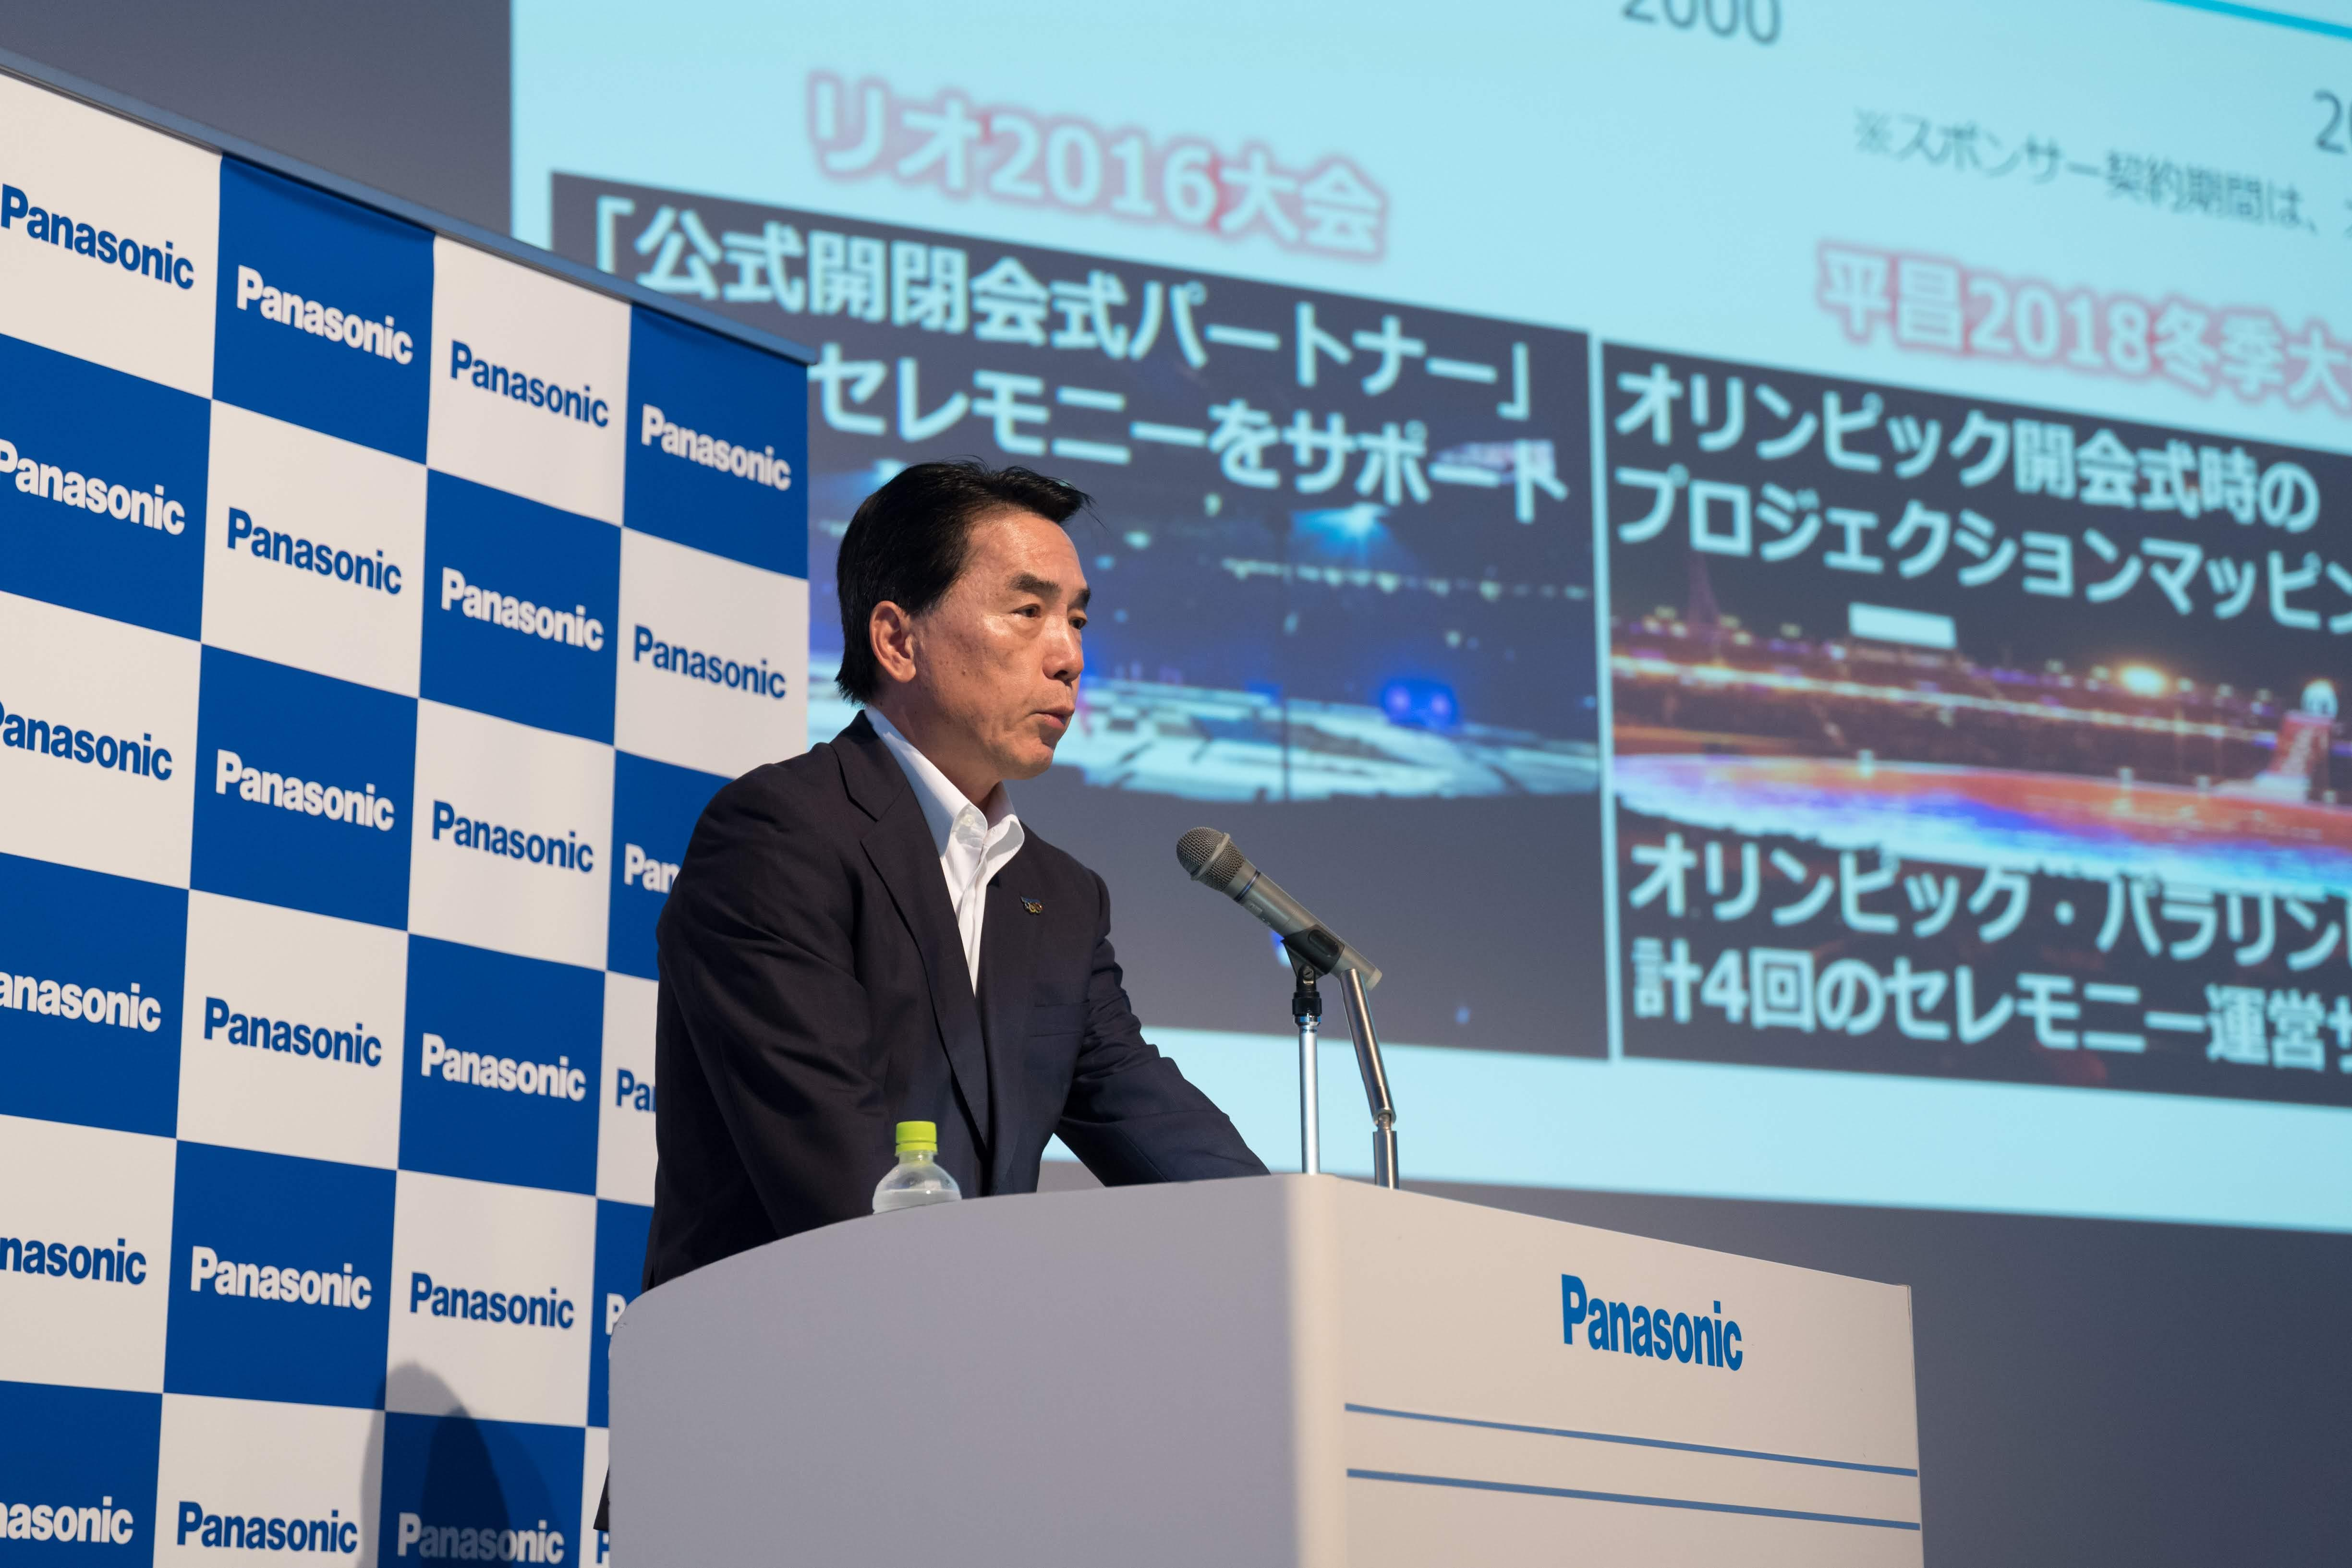 photo: Executive Officer Masahiro Ido, director of Panasonic's Tokyo Olympic & Paralympic Enterprise Division